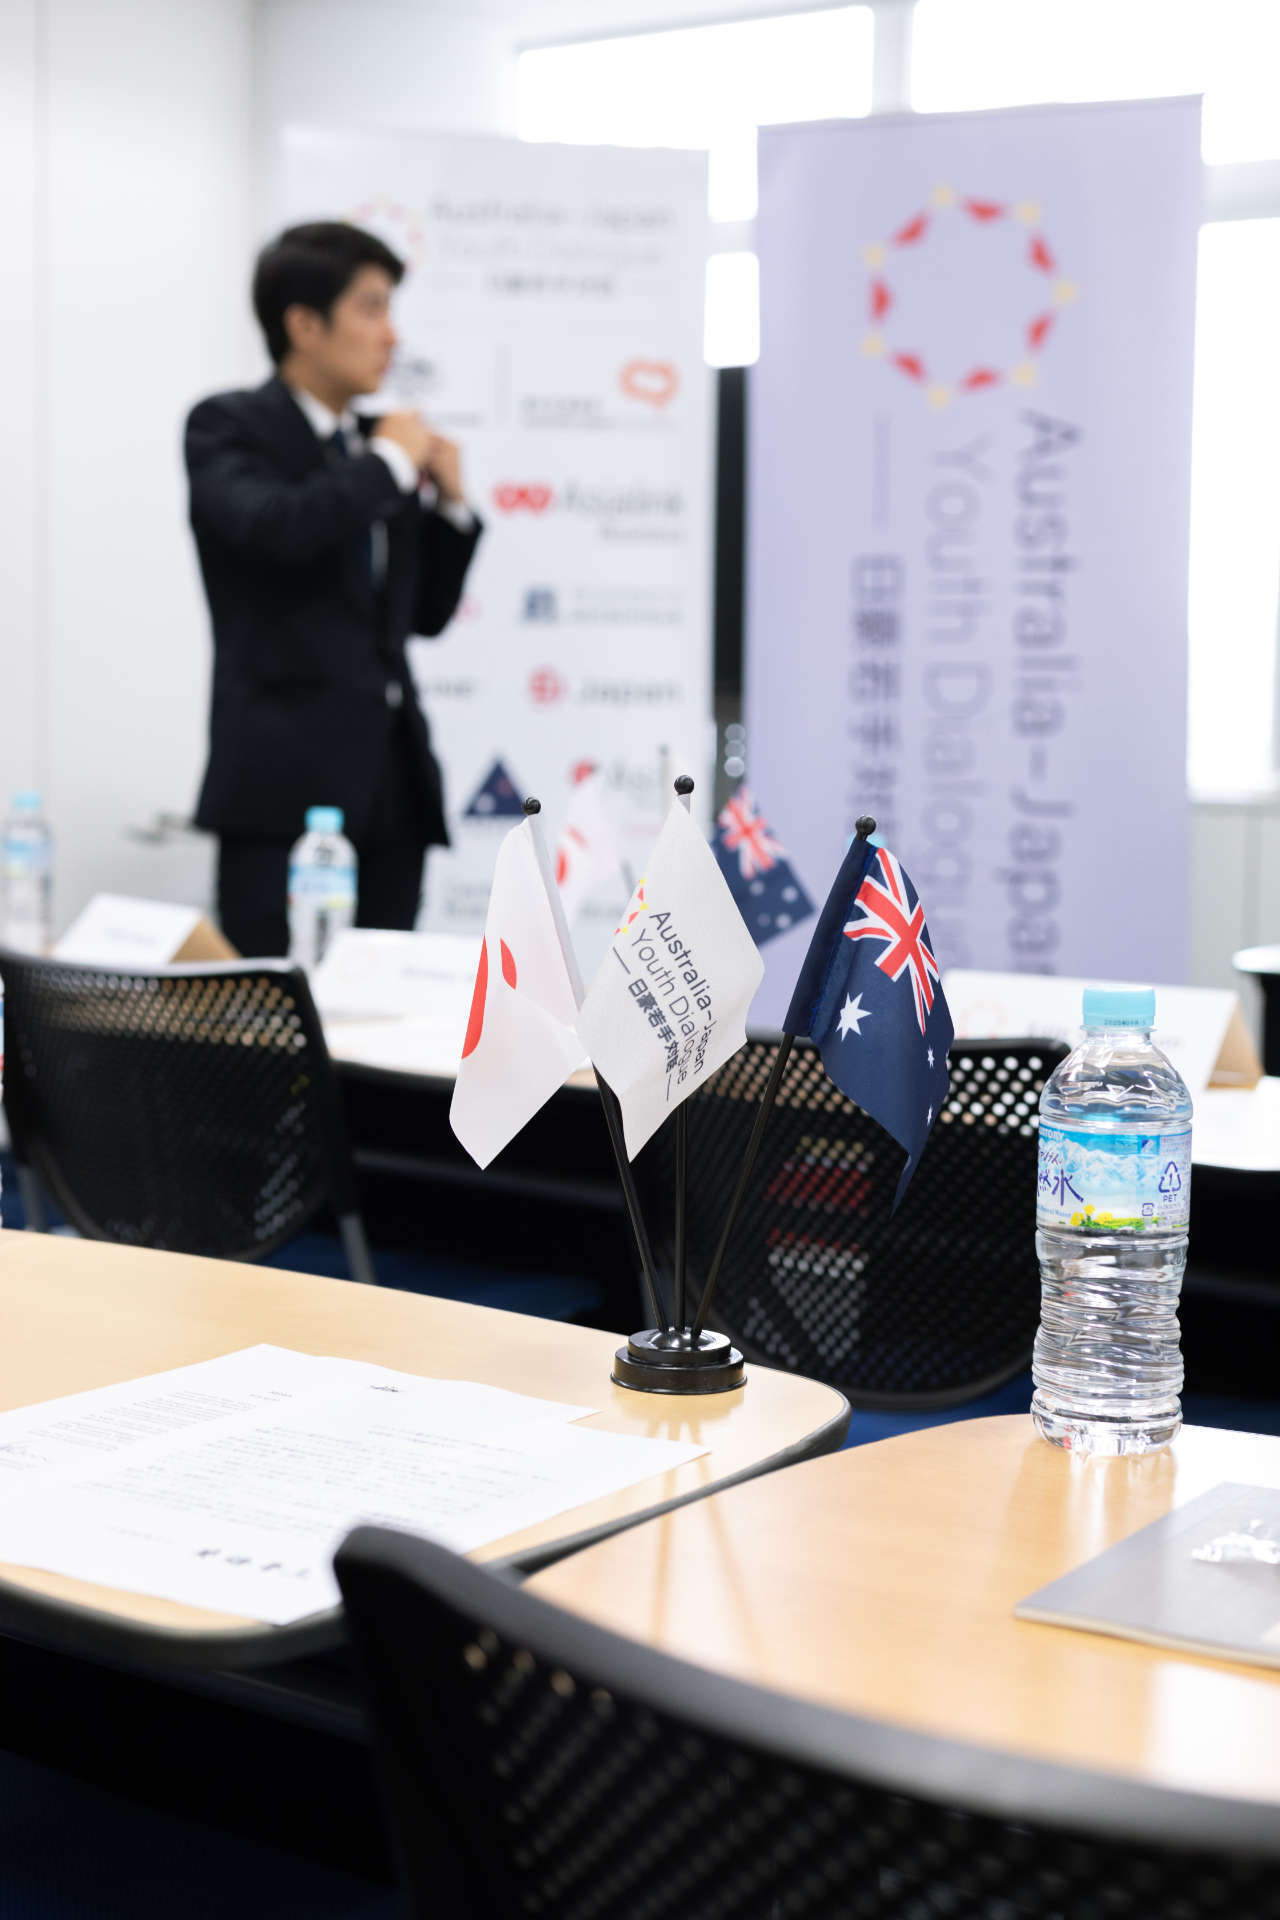 Australia-Japan Youth Dialogue - Japan & Australia Flags